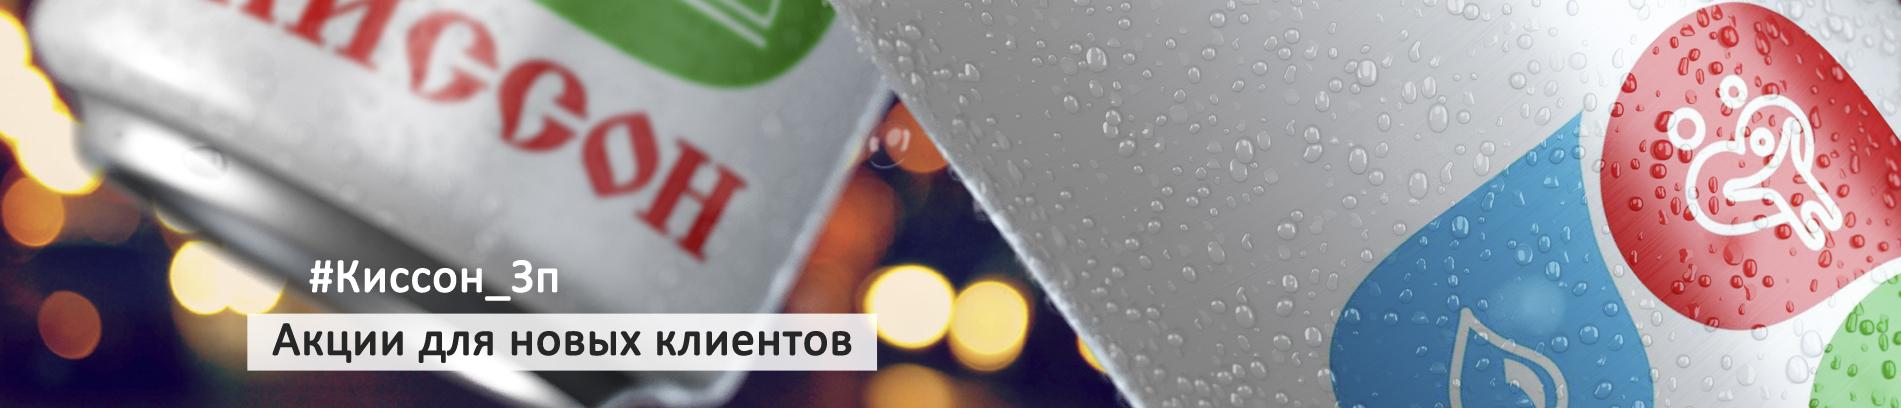 "ТМ ""КИССОН"" | Доставка воды Киссон в Запорожье"